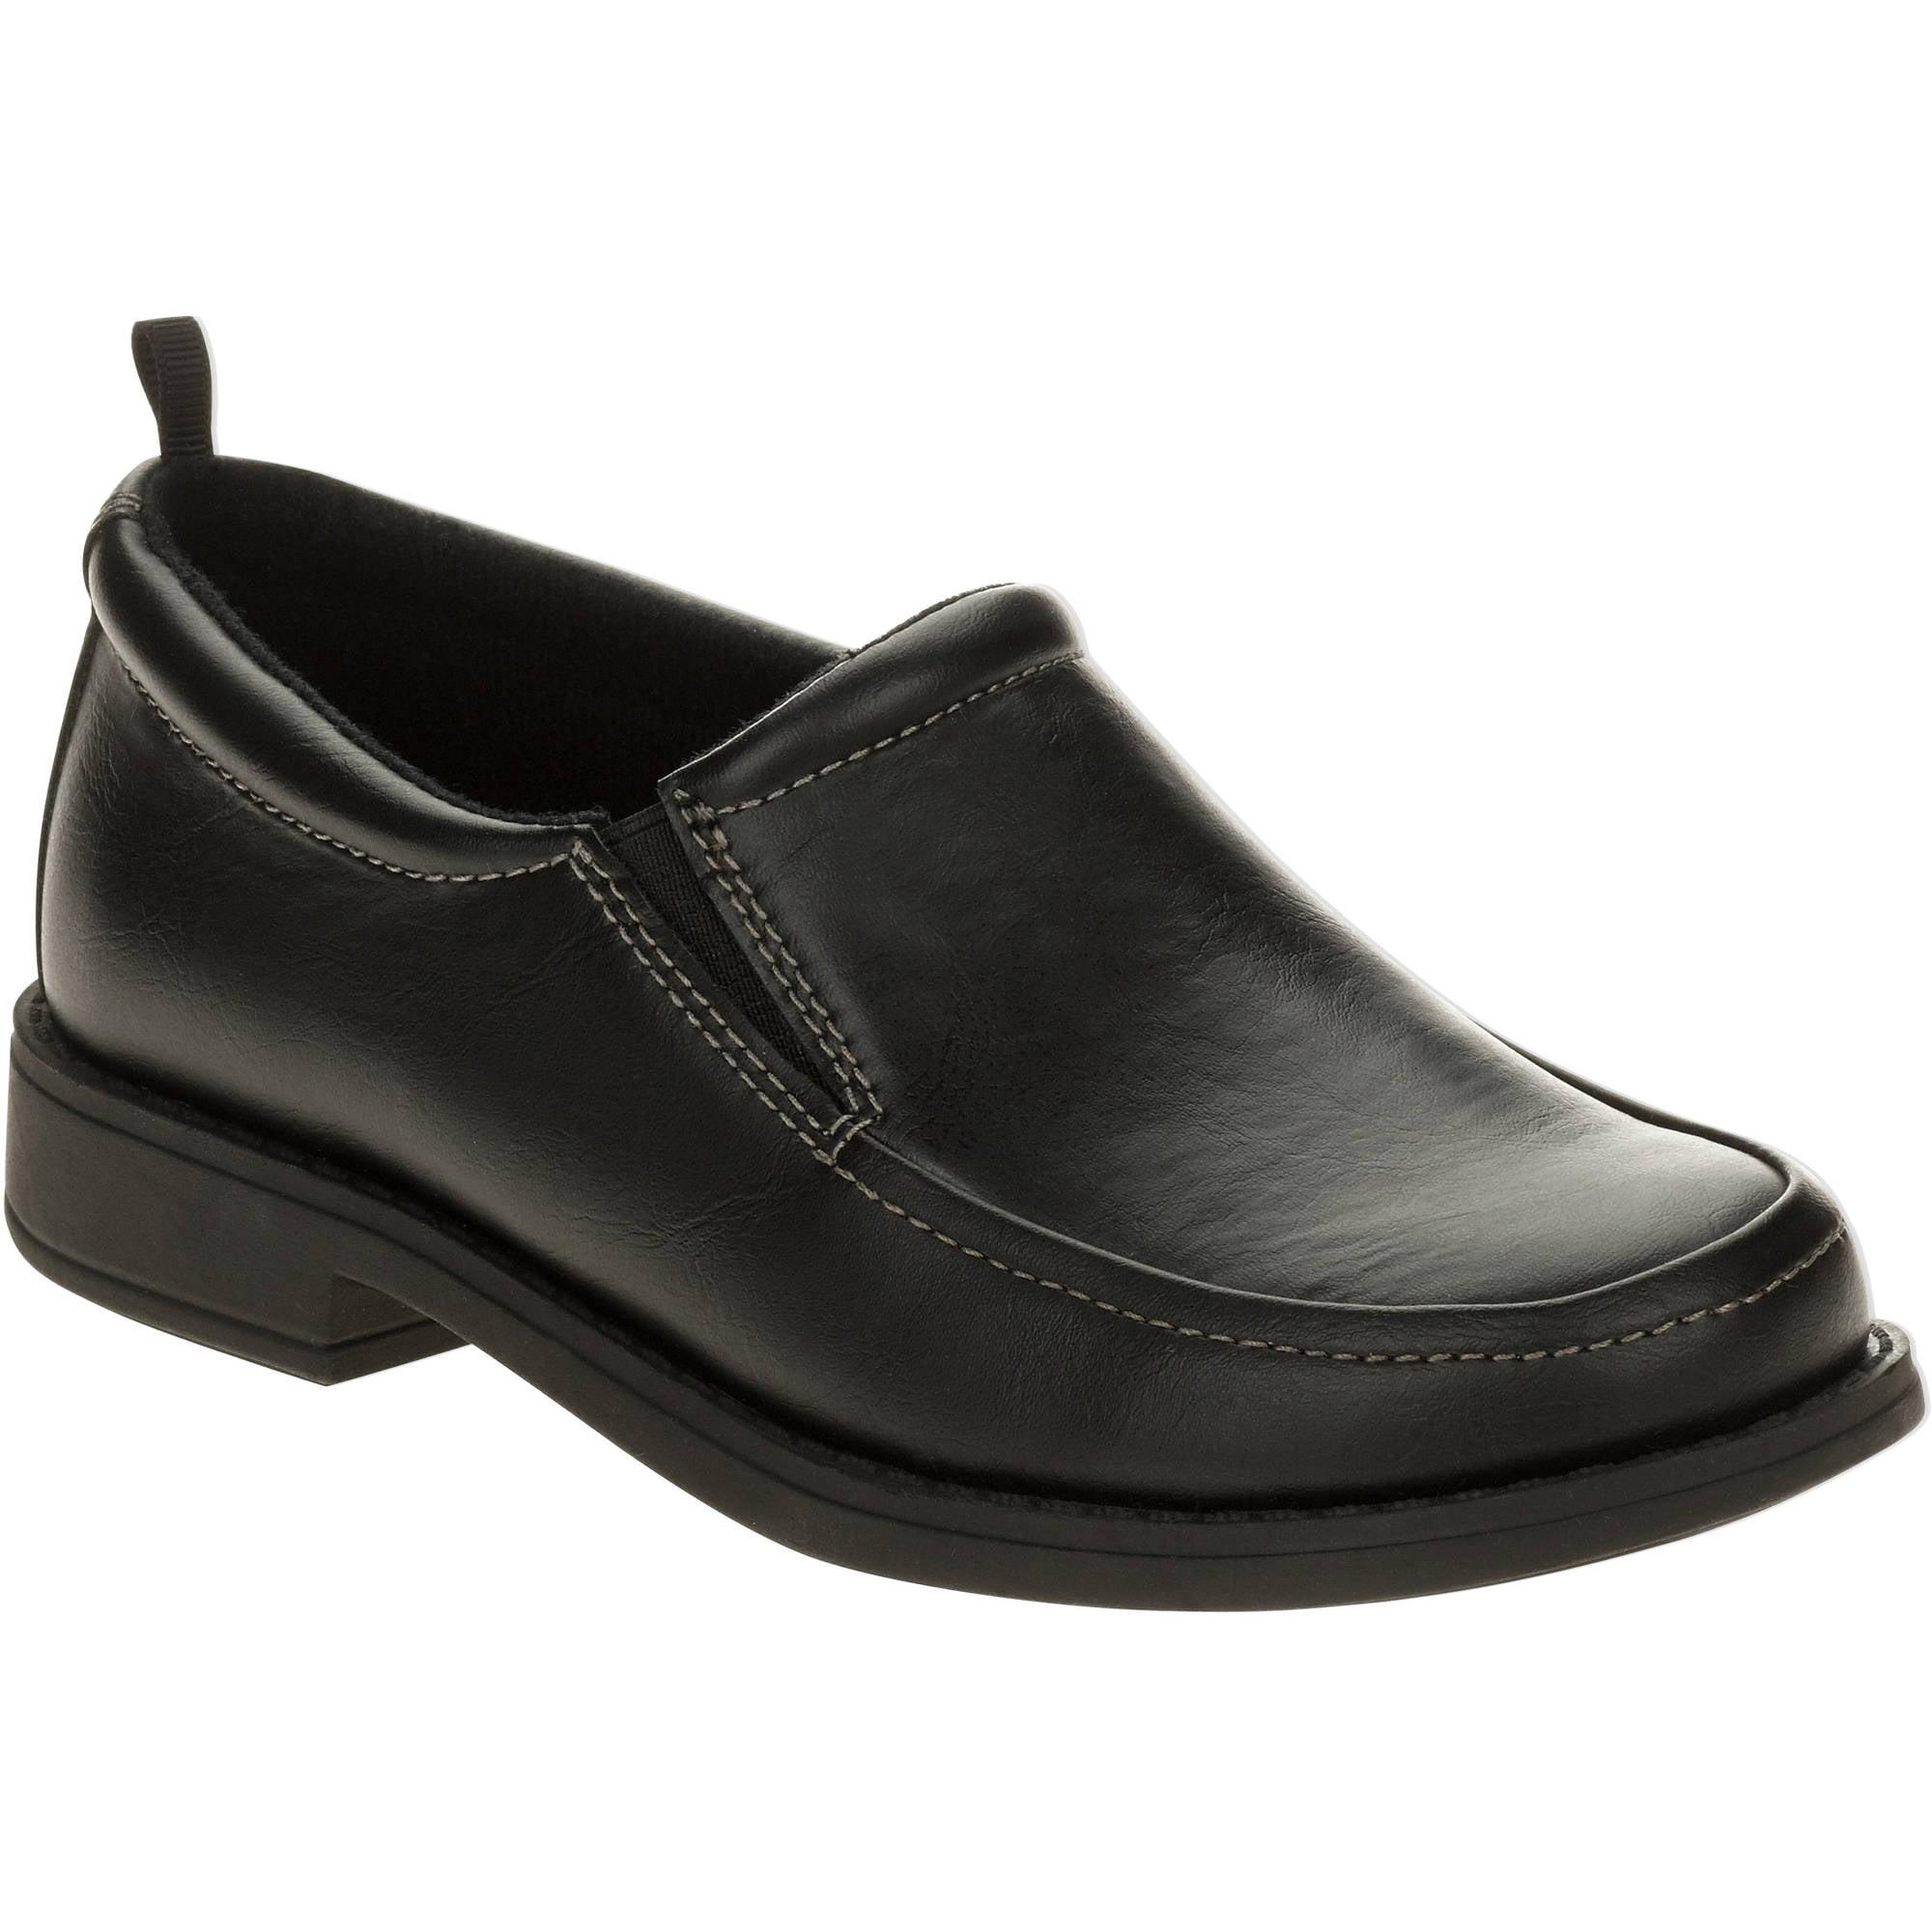 Boys' Slip-On Dress Shoe